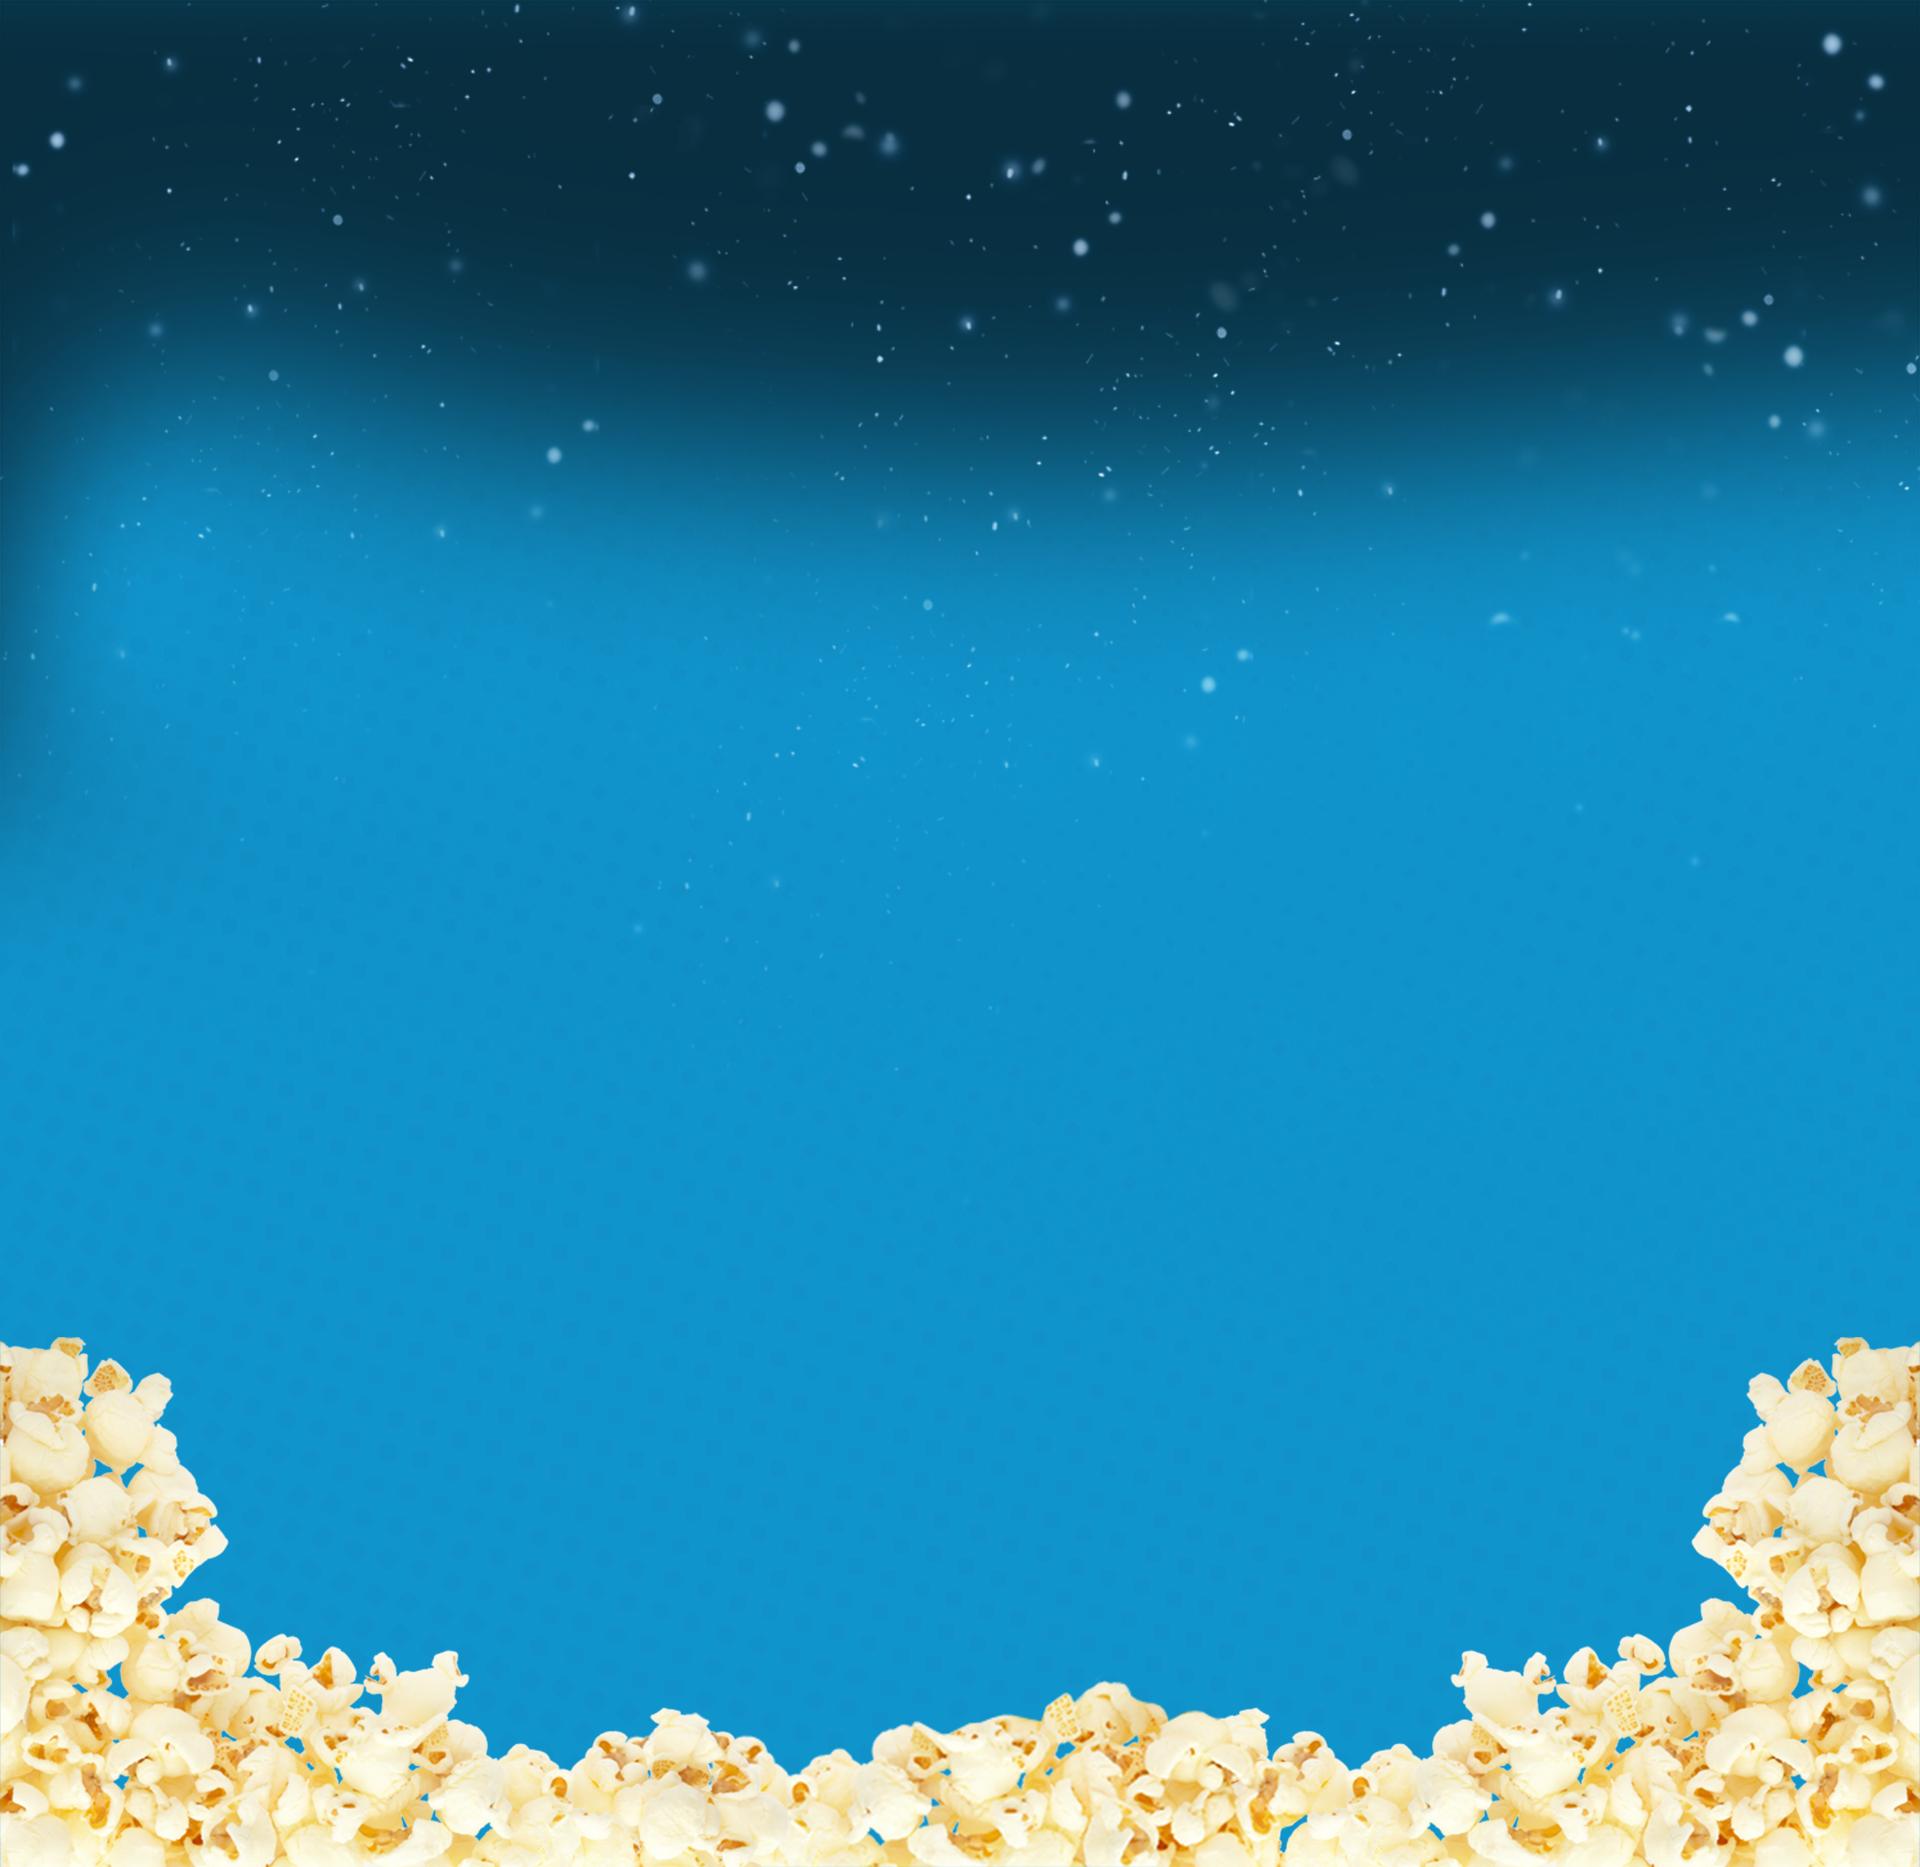 Popcorn Wallpaper: Background - Popcorn On Blue